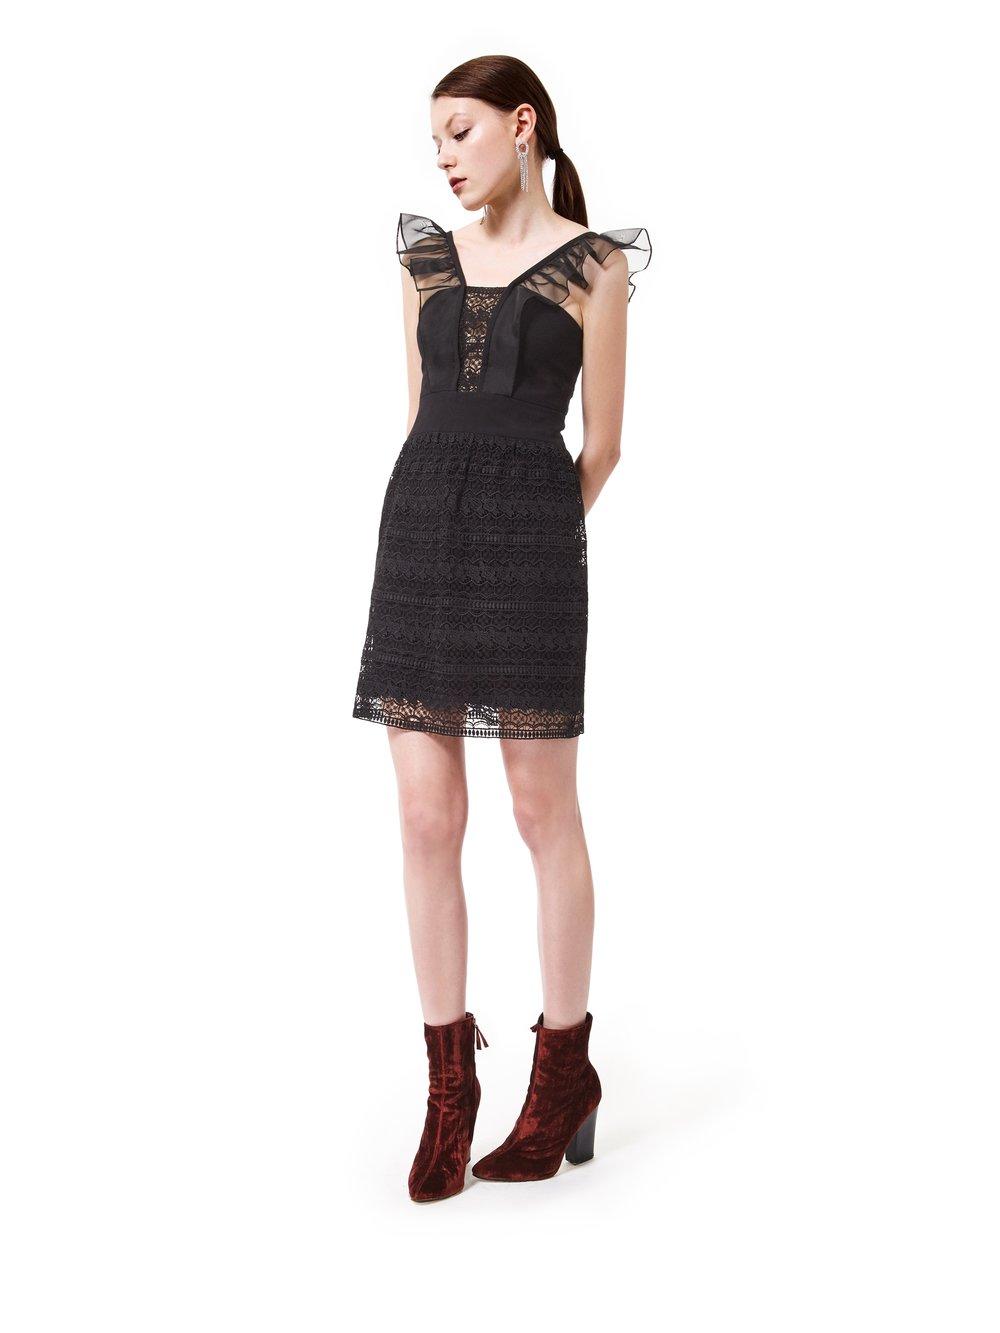 Shadow Dancer Dress £240